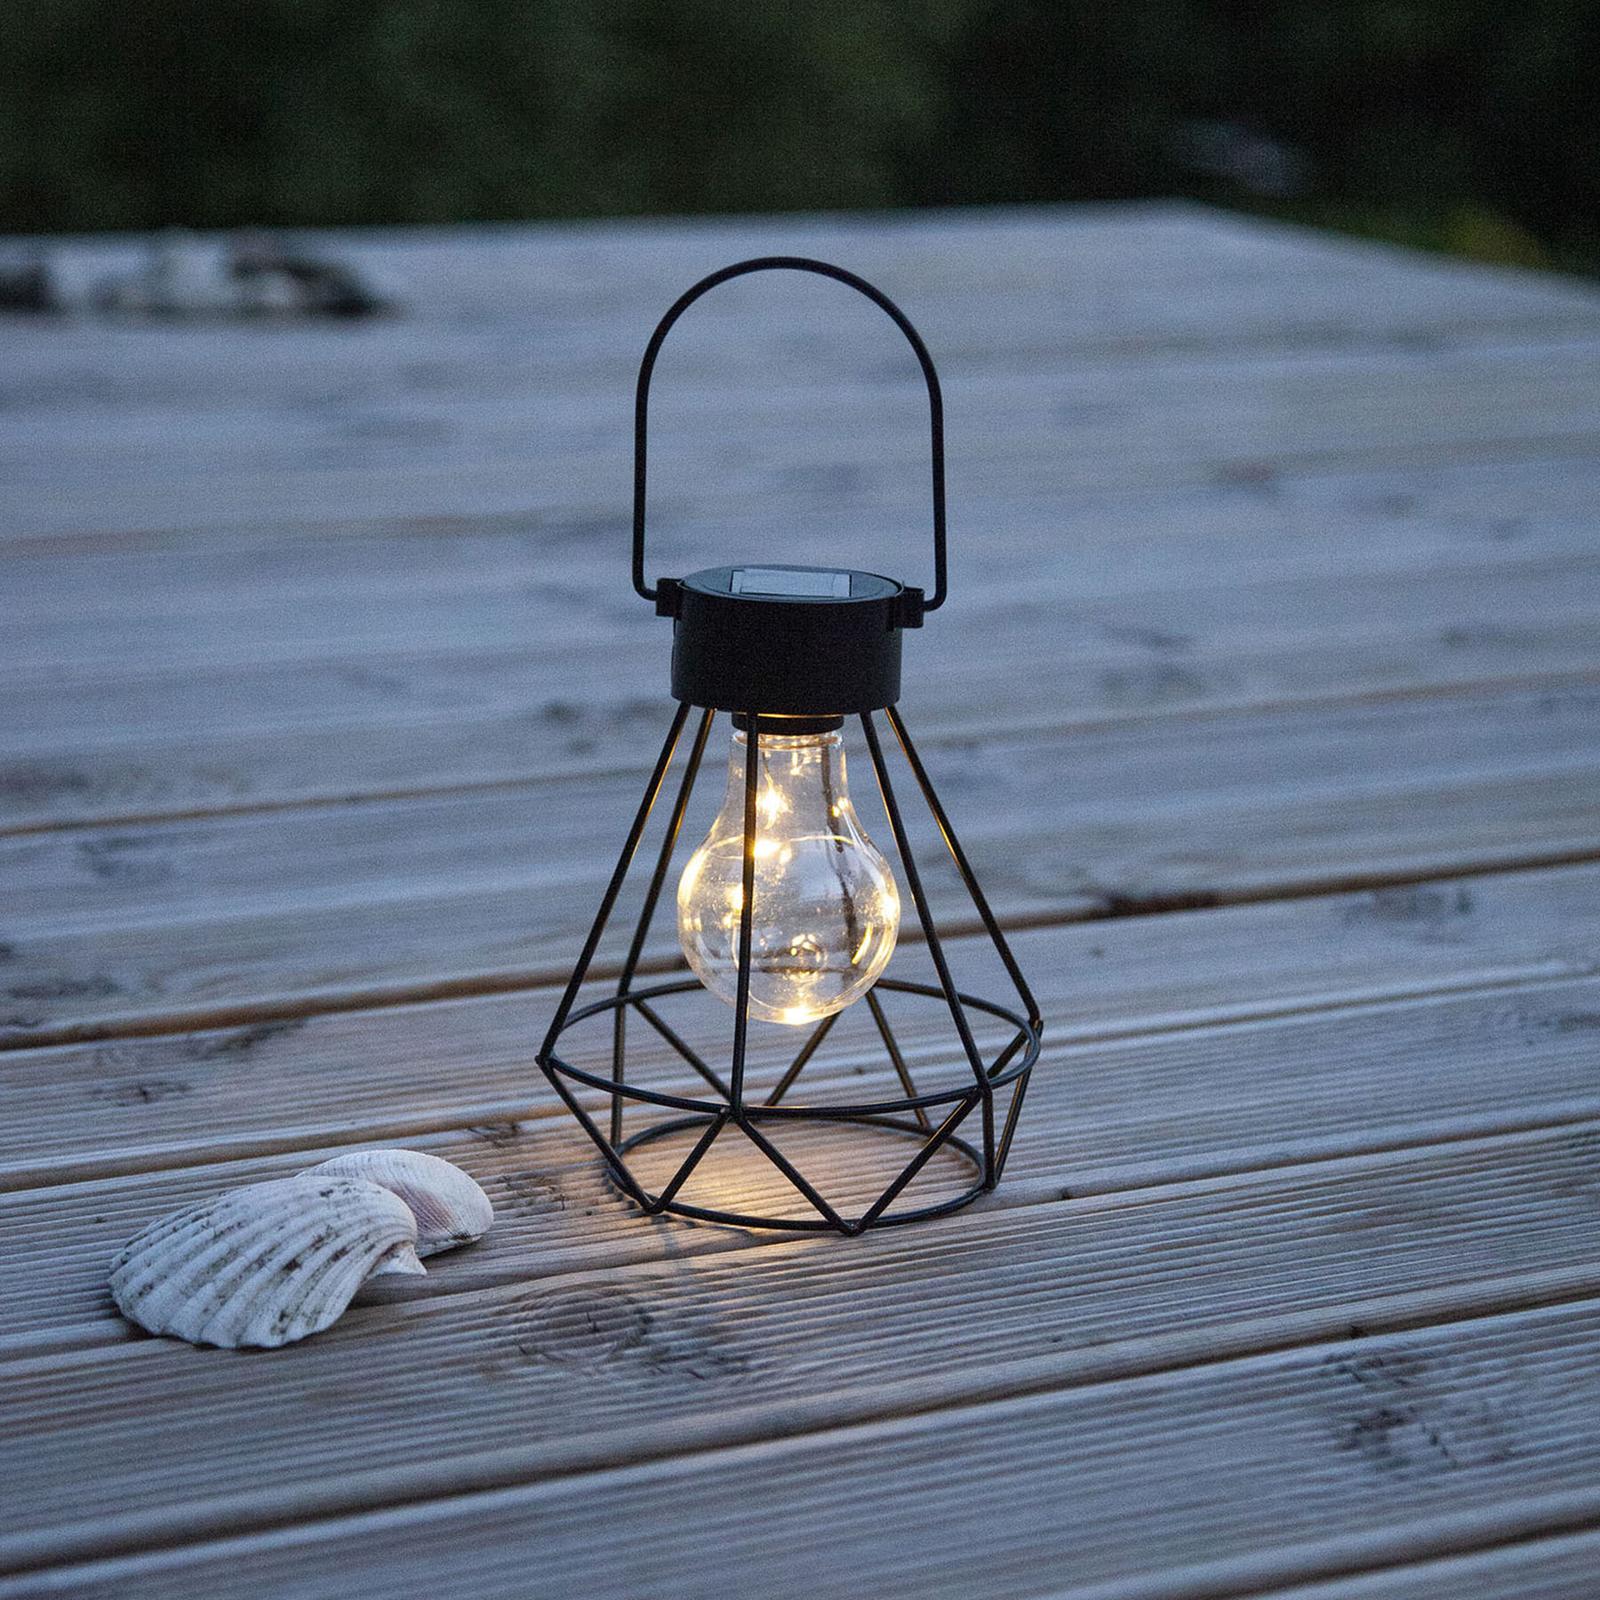 Eddy LED solar decorative lantern, cage lampshade_1523858_1